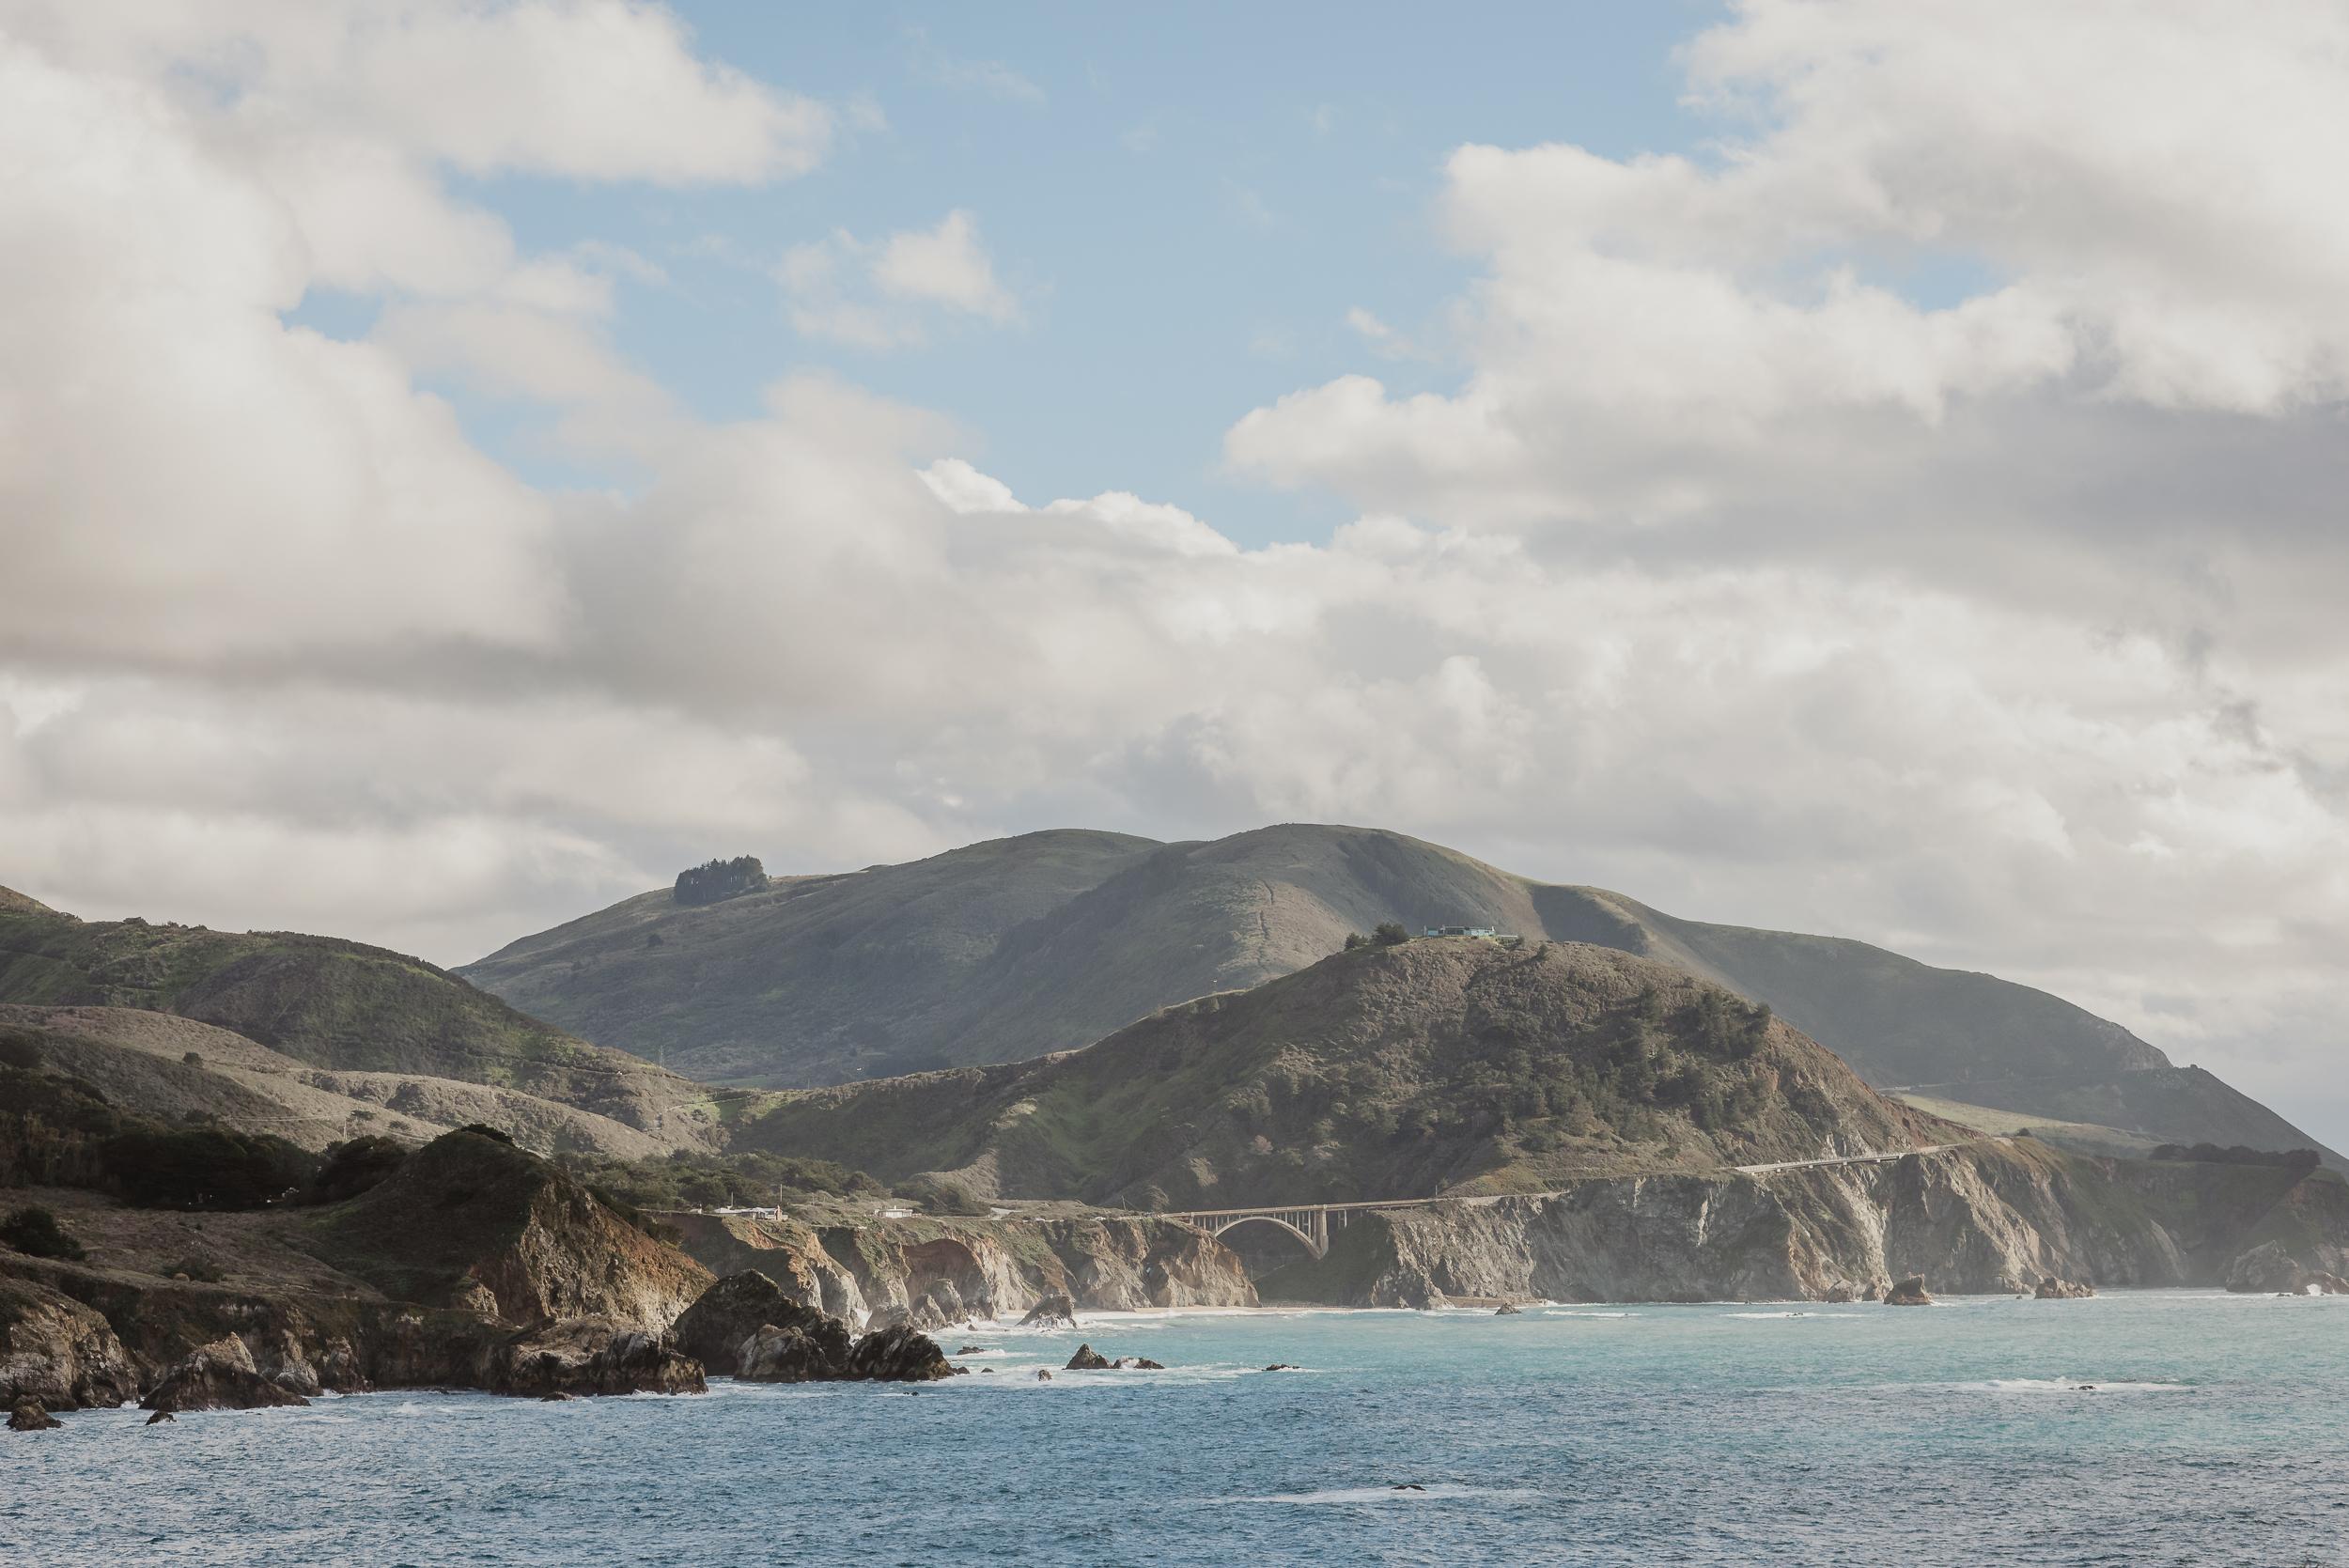 carmel-big-sur-garrapata-state-park-california-coast-engagement-session-vivianchen-001.jpg